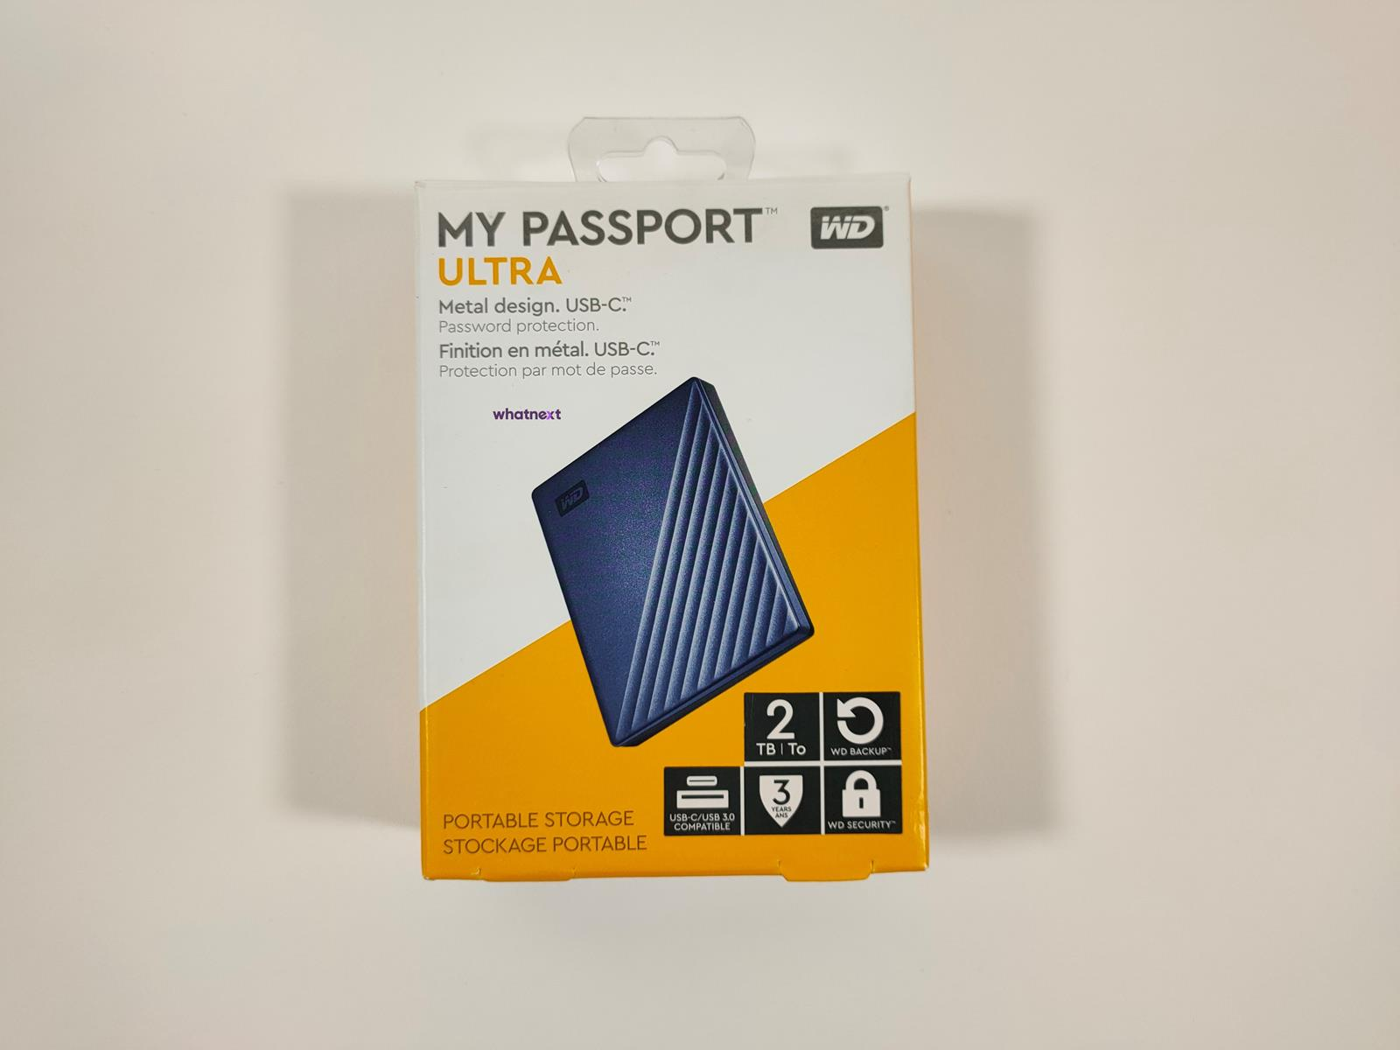 test WD My Passport Ultra 2TB USB-C, recenzja WD My Passport Ultra 2TB USB-C, opinia WD My Passport Ultra 2TB USB-C, review WD My Passport Ultra 2TB USB-C